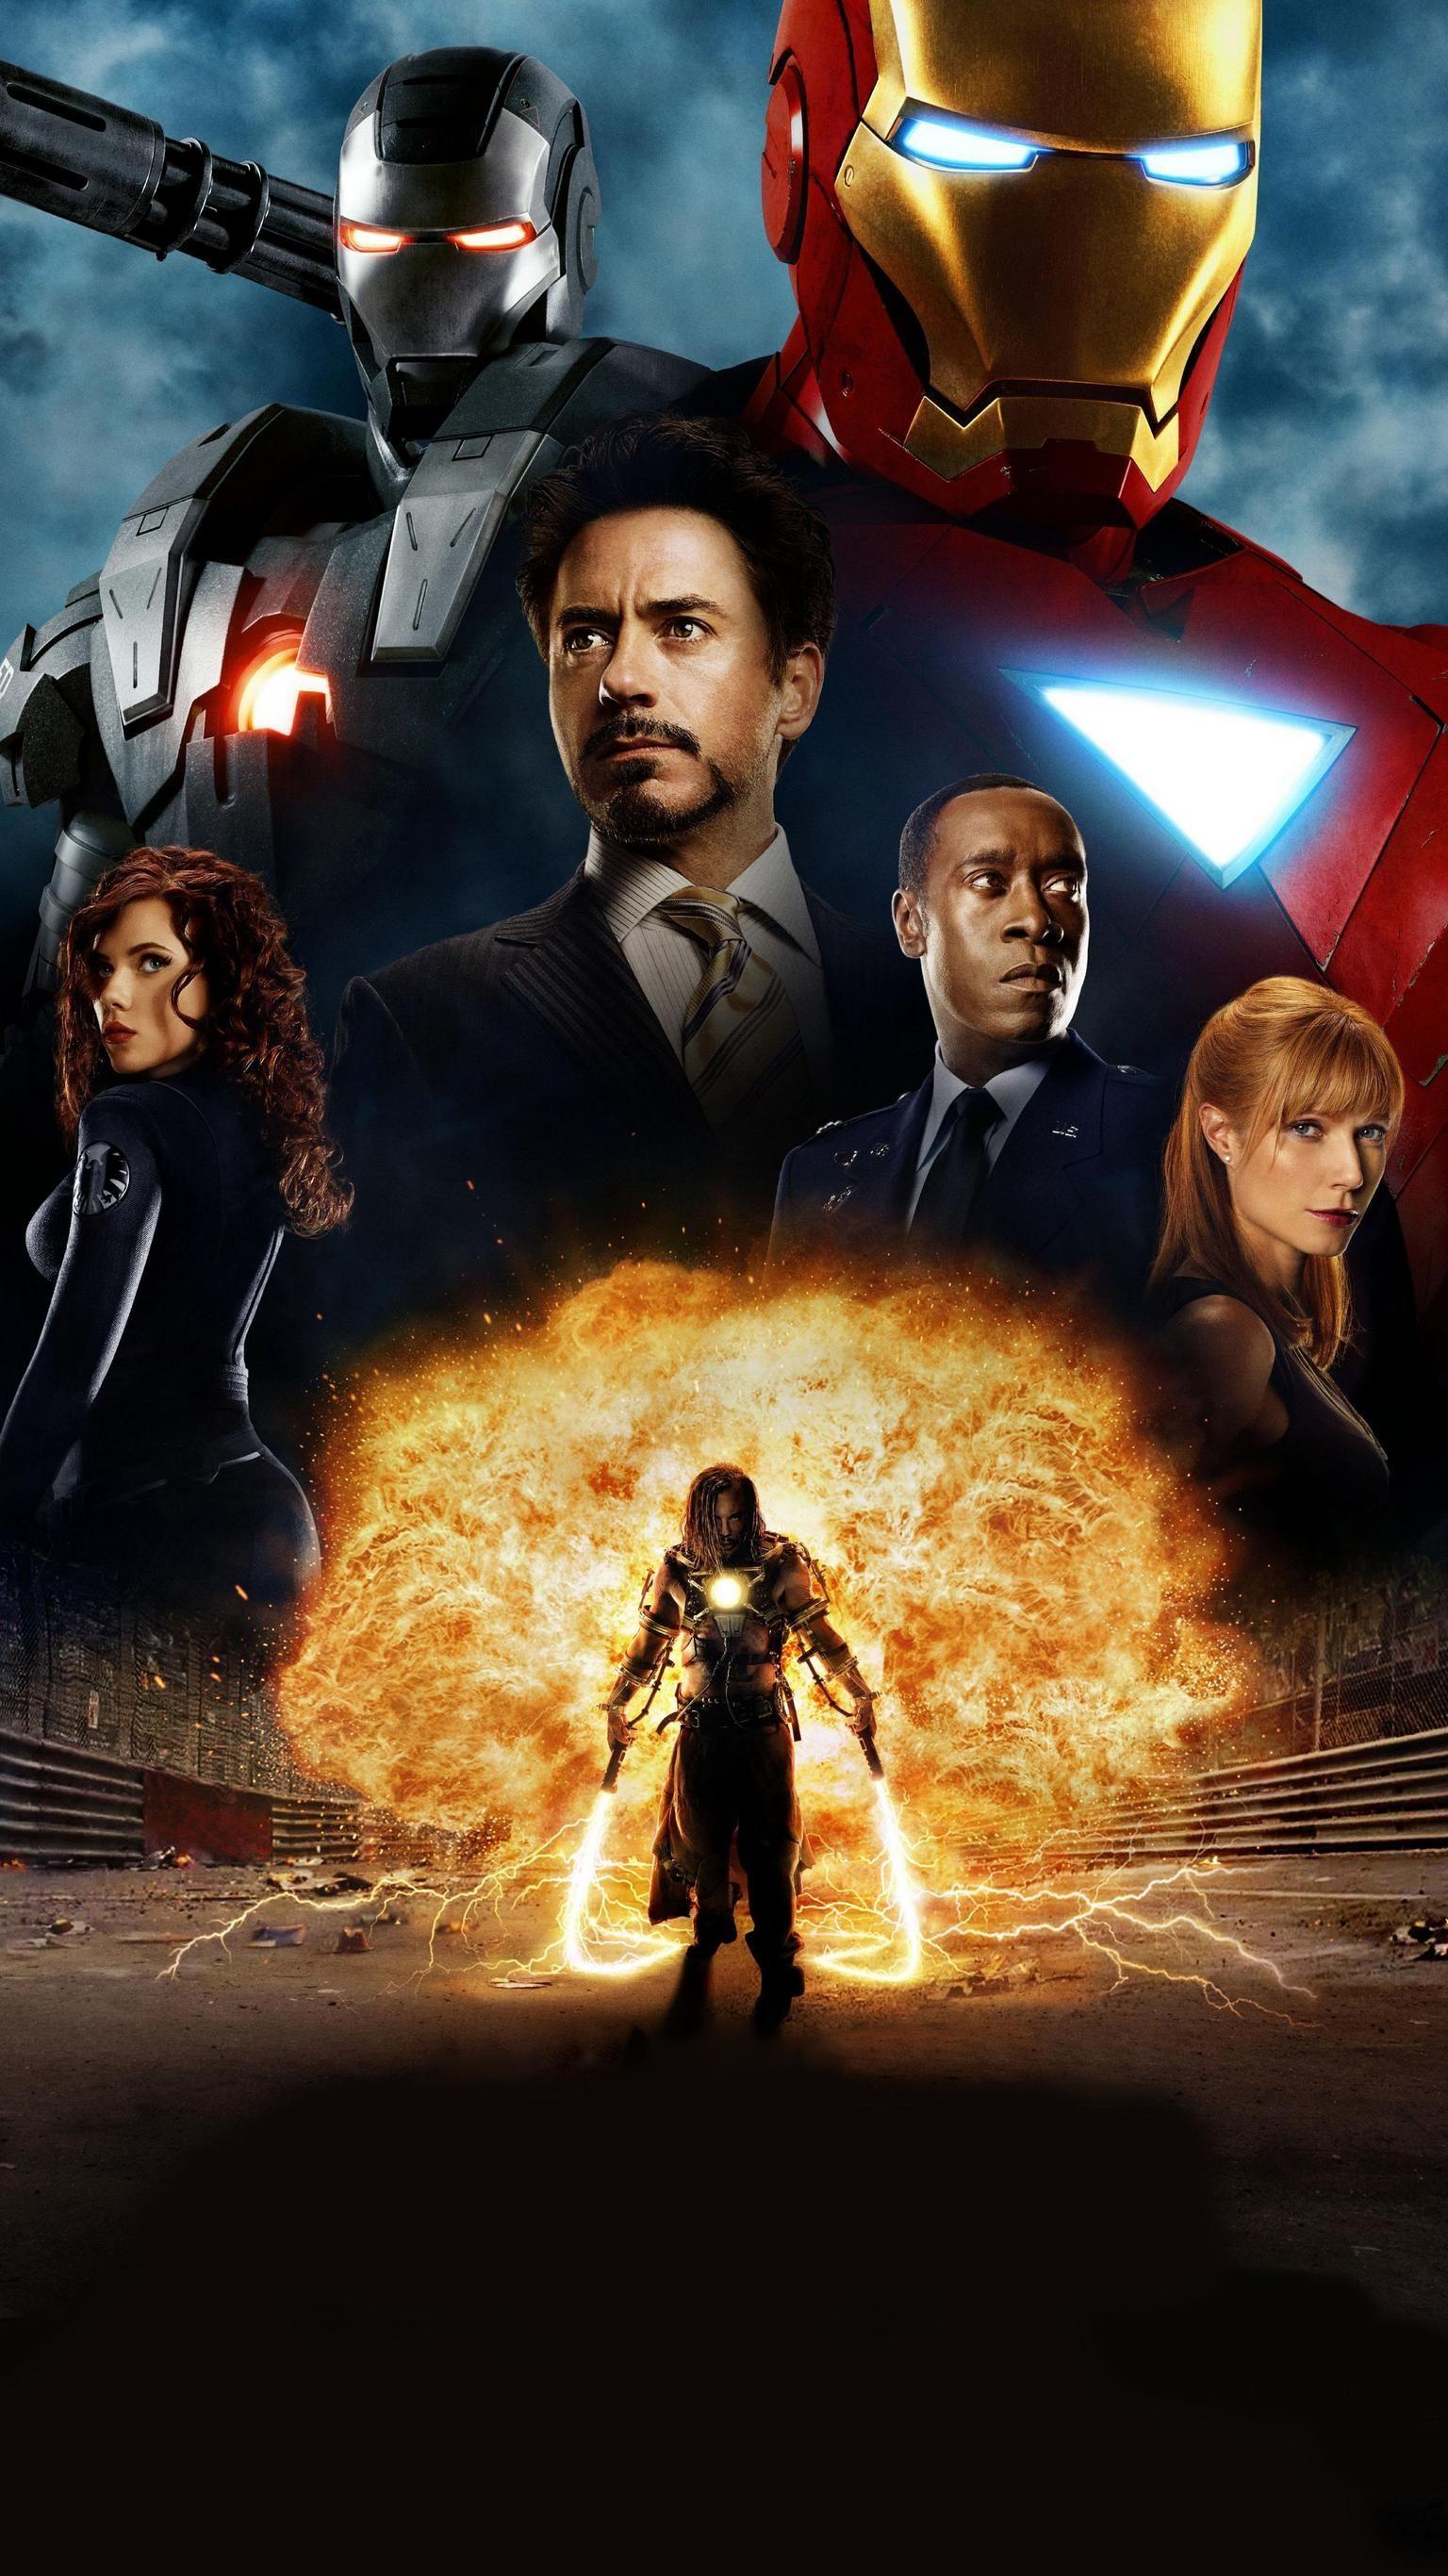 Iron Man 2 2010 Phone Wallpaper Moviemania Filme Plakat Marvel Iron Man